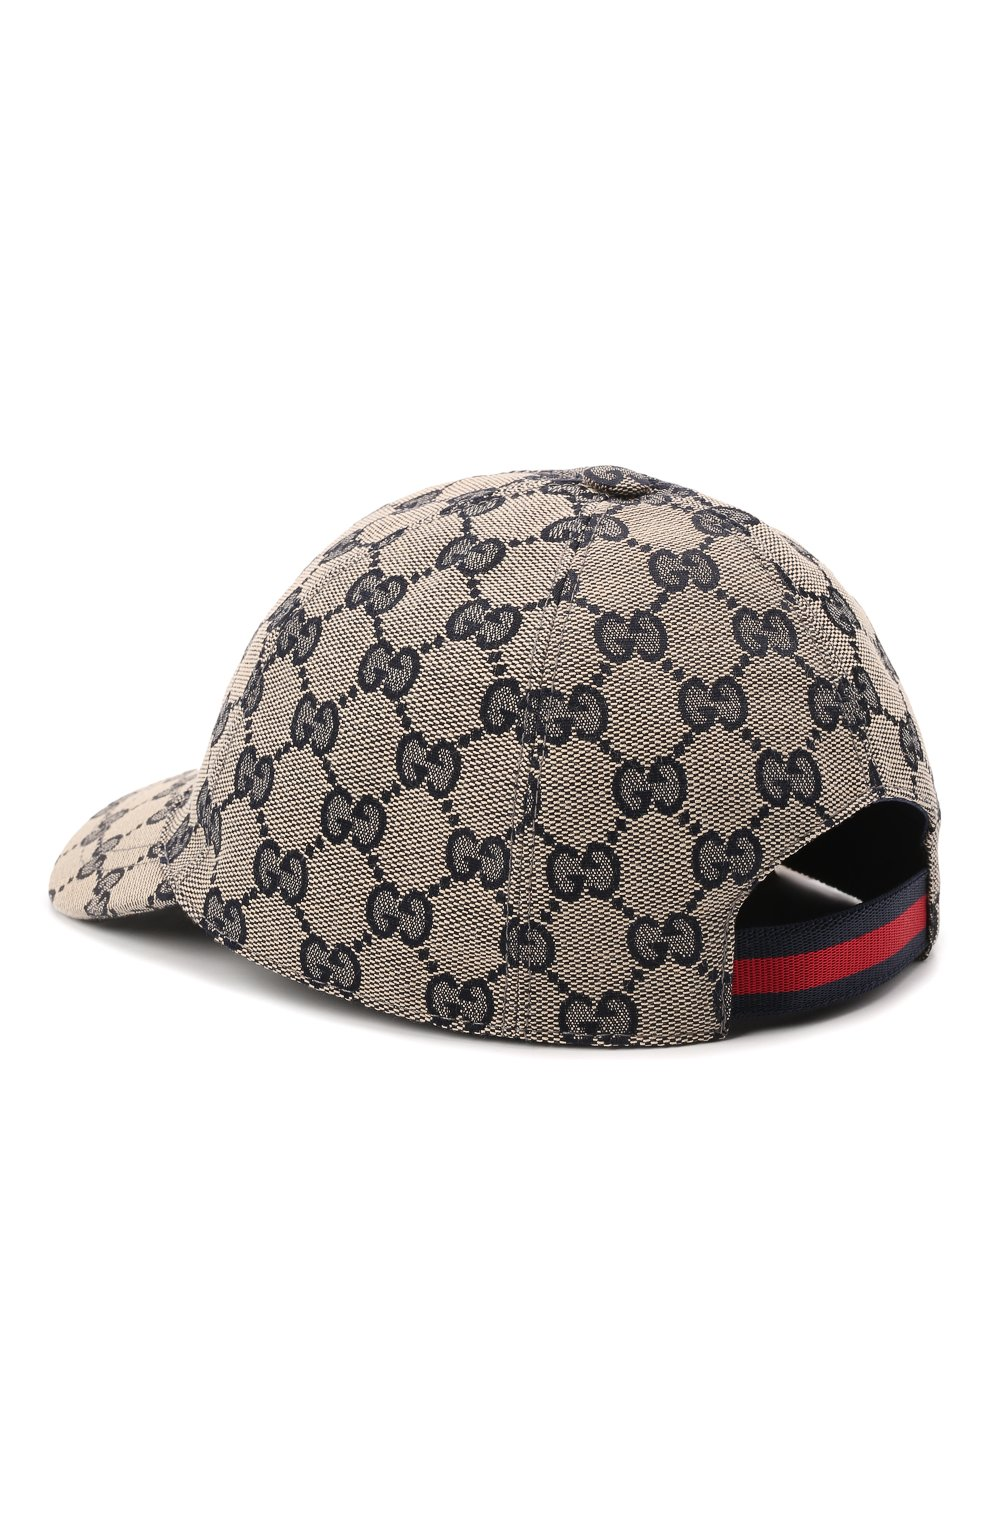 Бейсболка Gucci светло-коричневого цвета   Фото №2